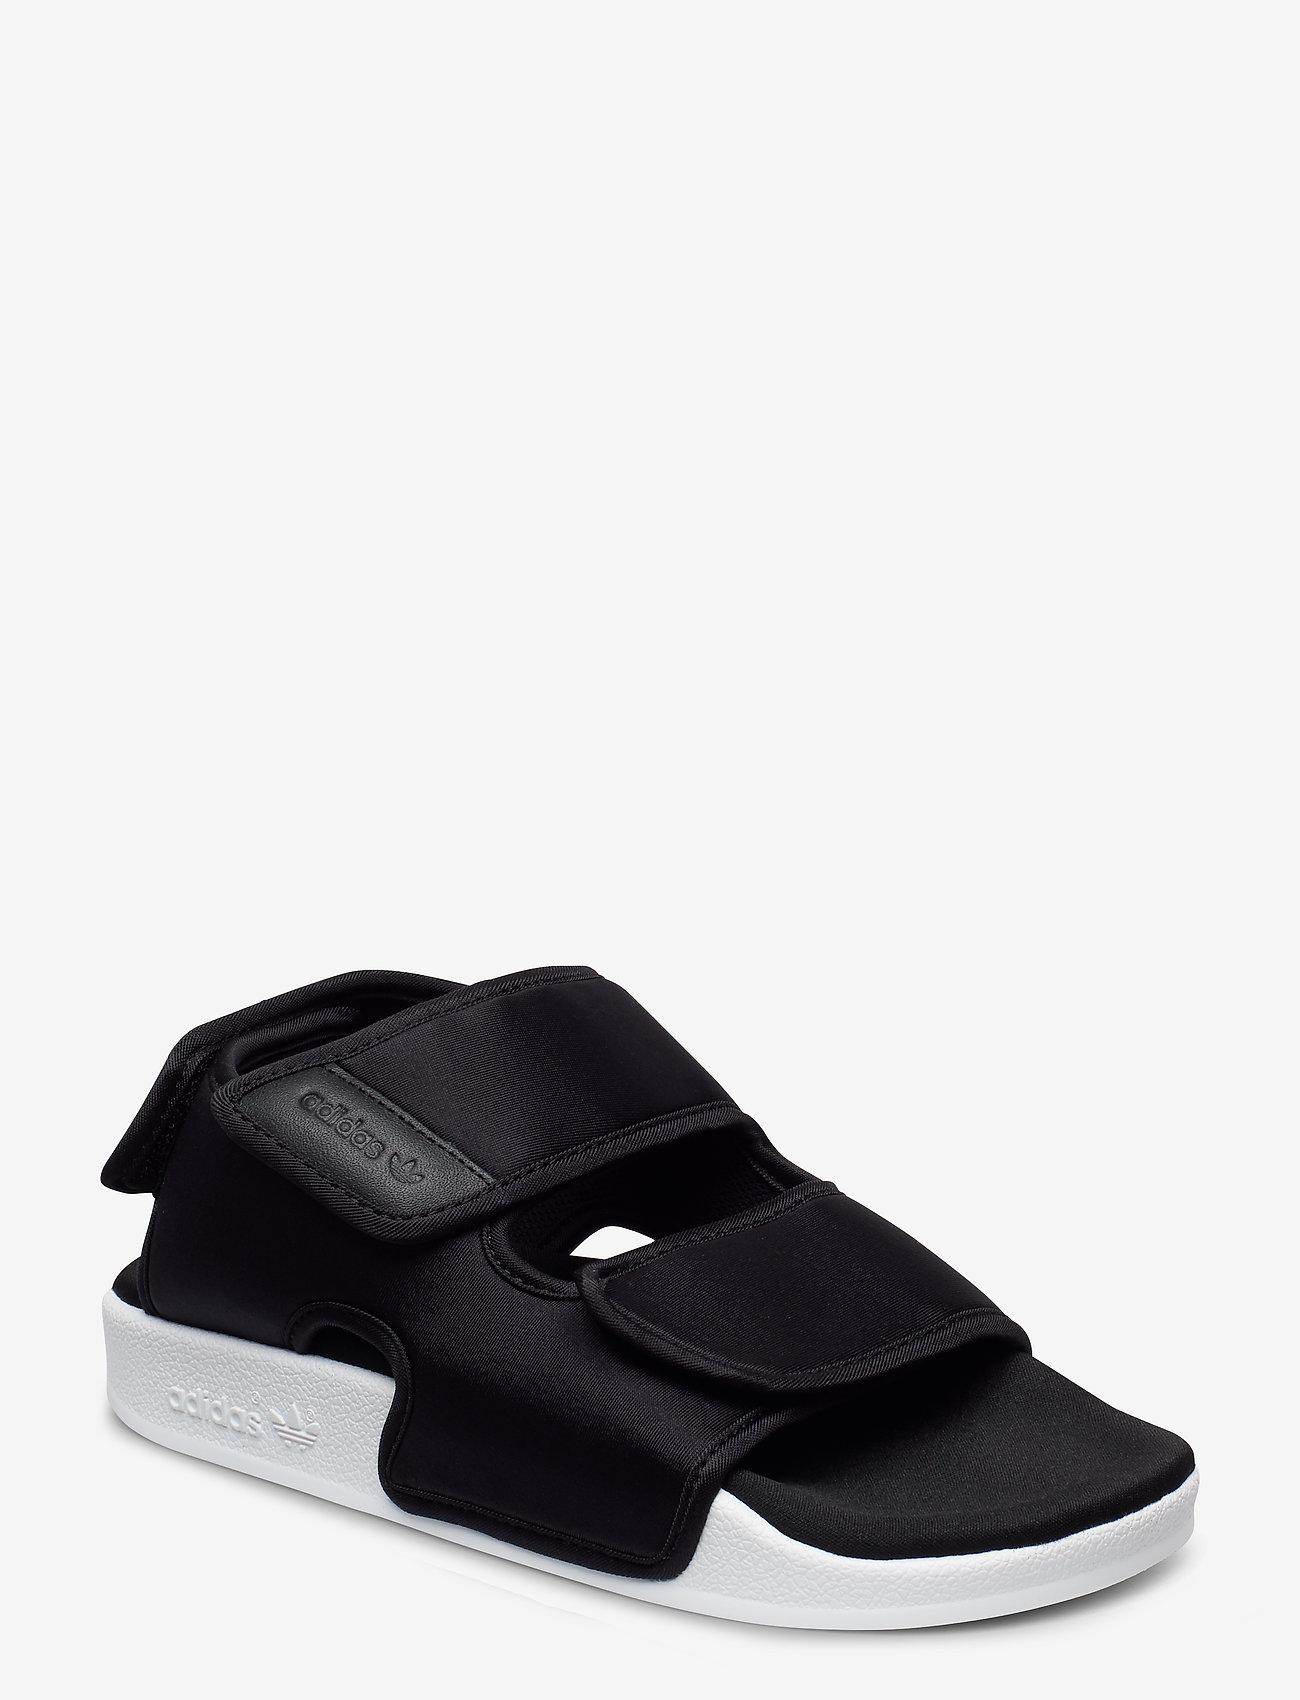 adidas Originals - ADILETTE SANDAL 3.0 - płaskie sandały - cblack/cblack/ftwwht - 0